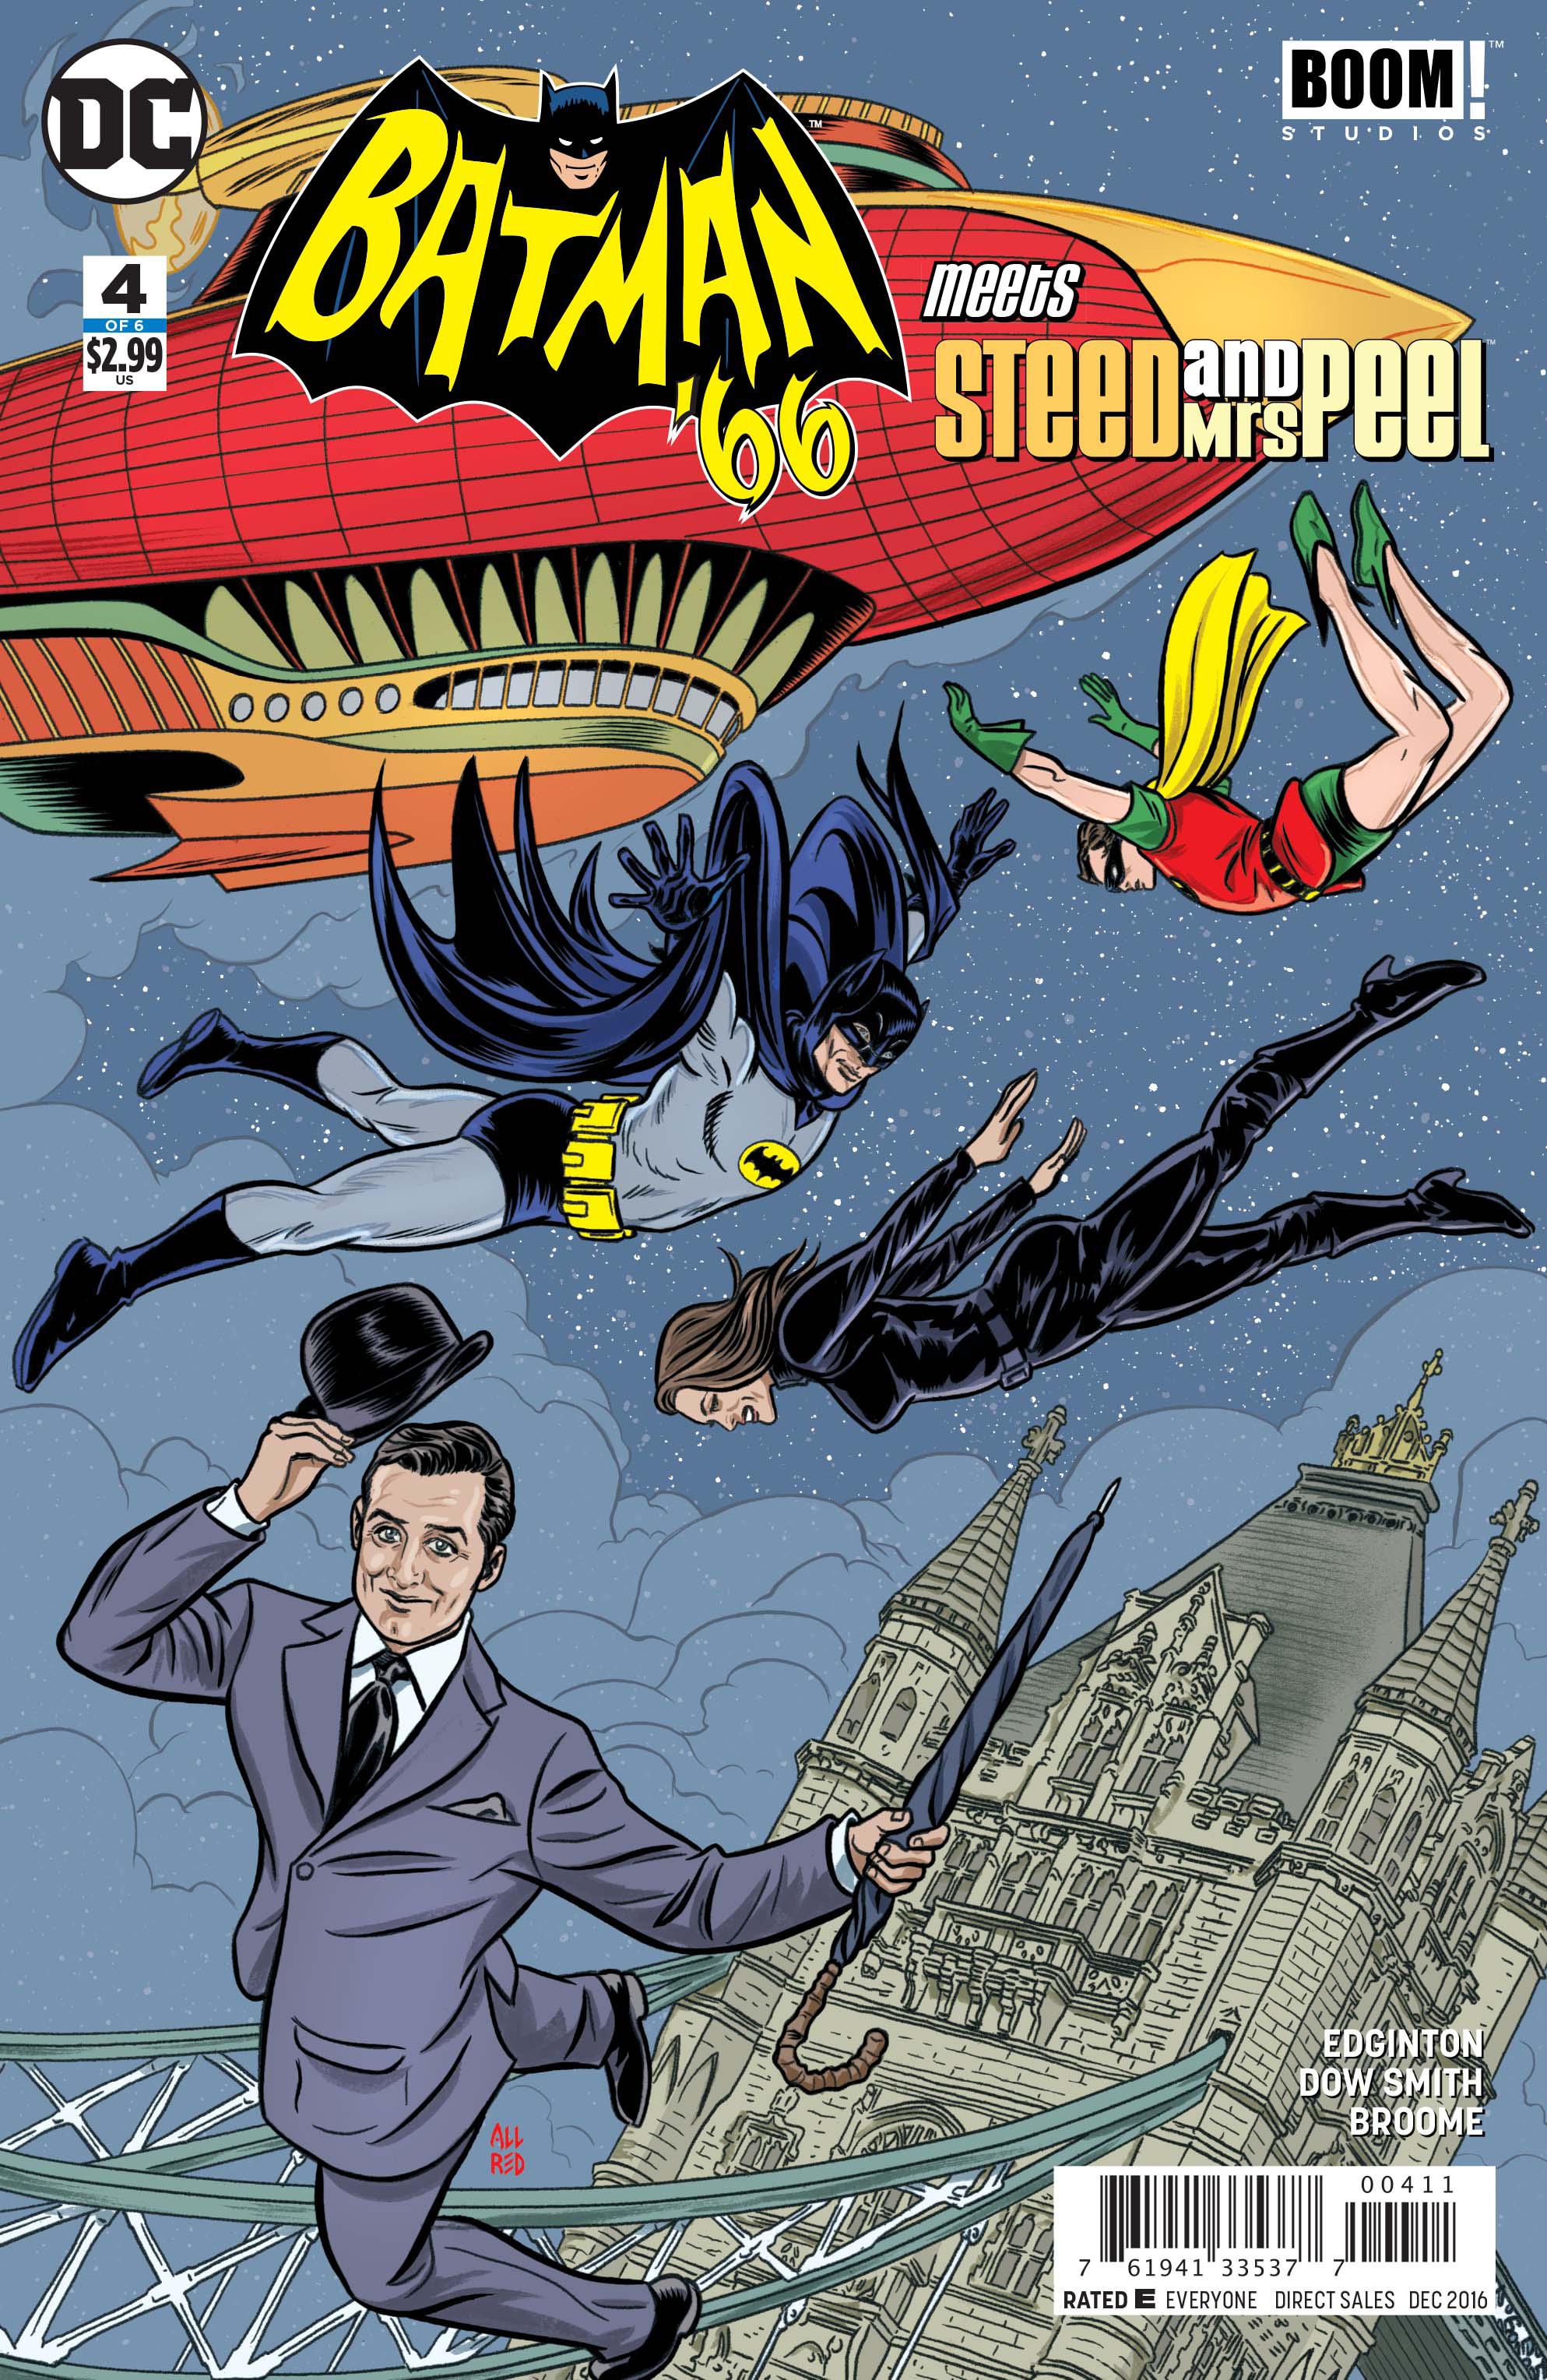 Avengers Comics - Page 2 STL020223?type=